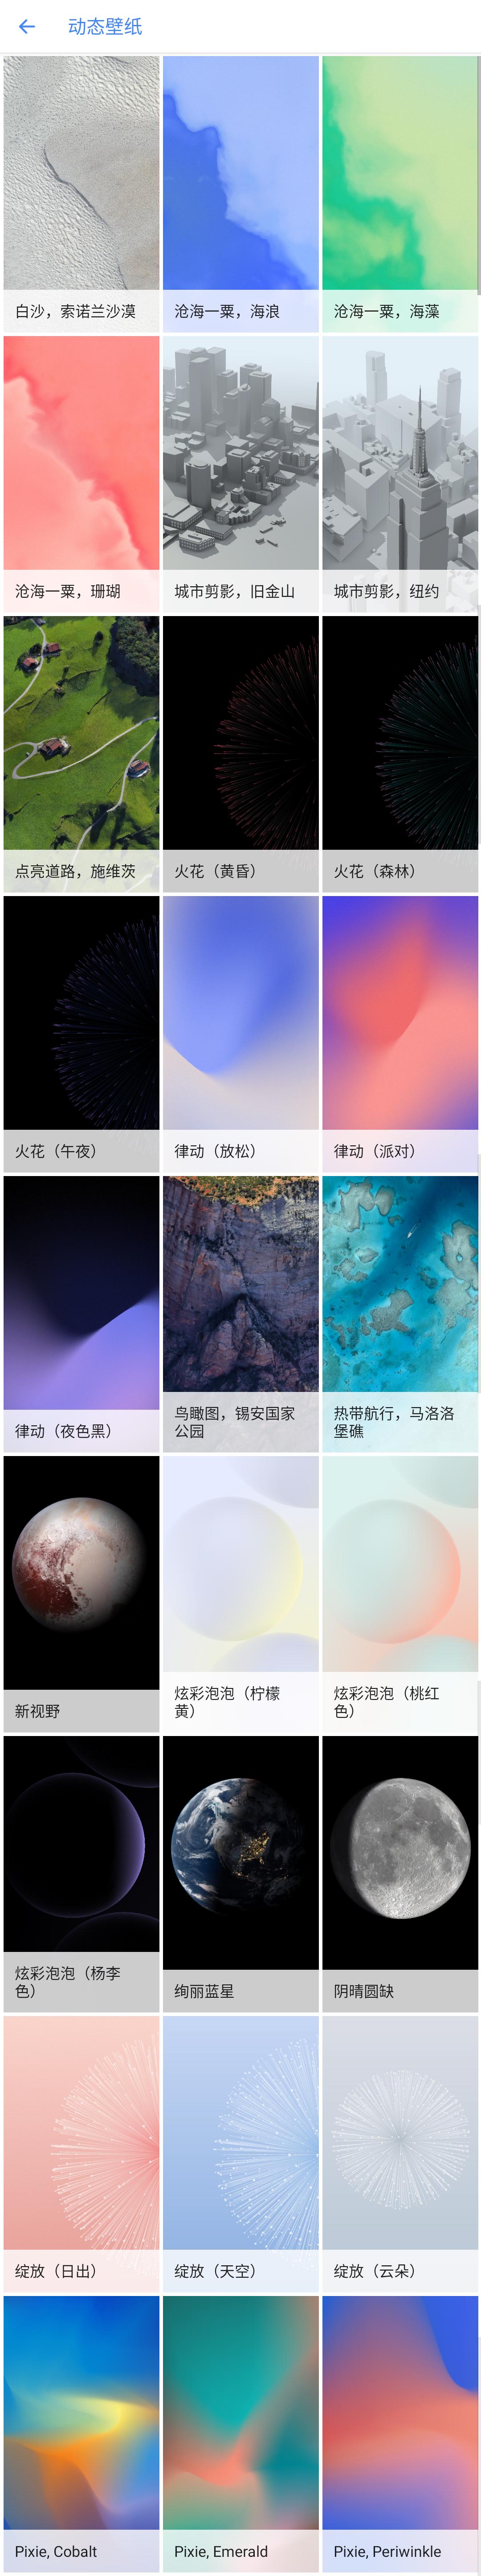 Google Pixel3 超炫动态壁纸,支持息屏显示